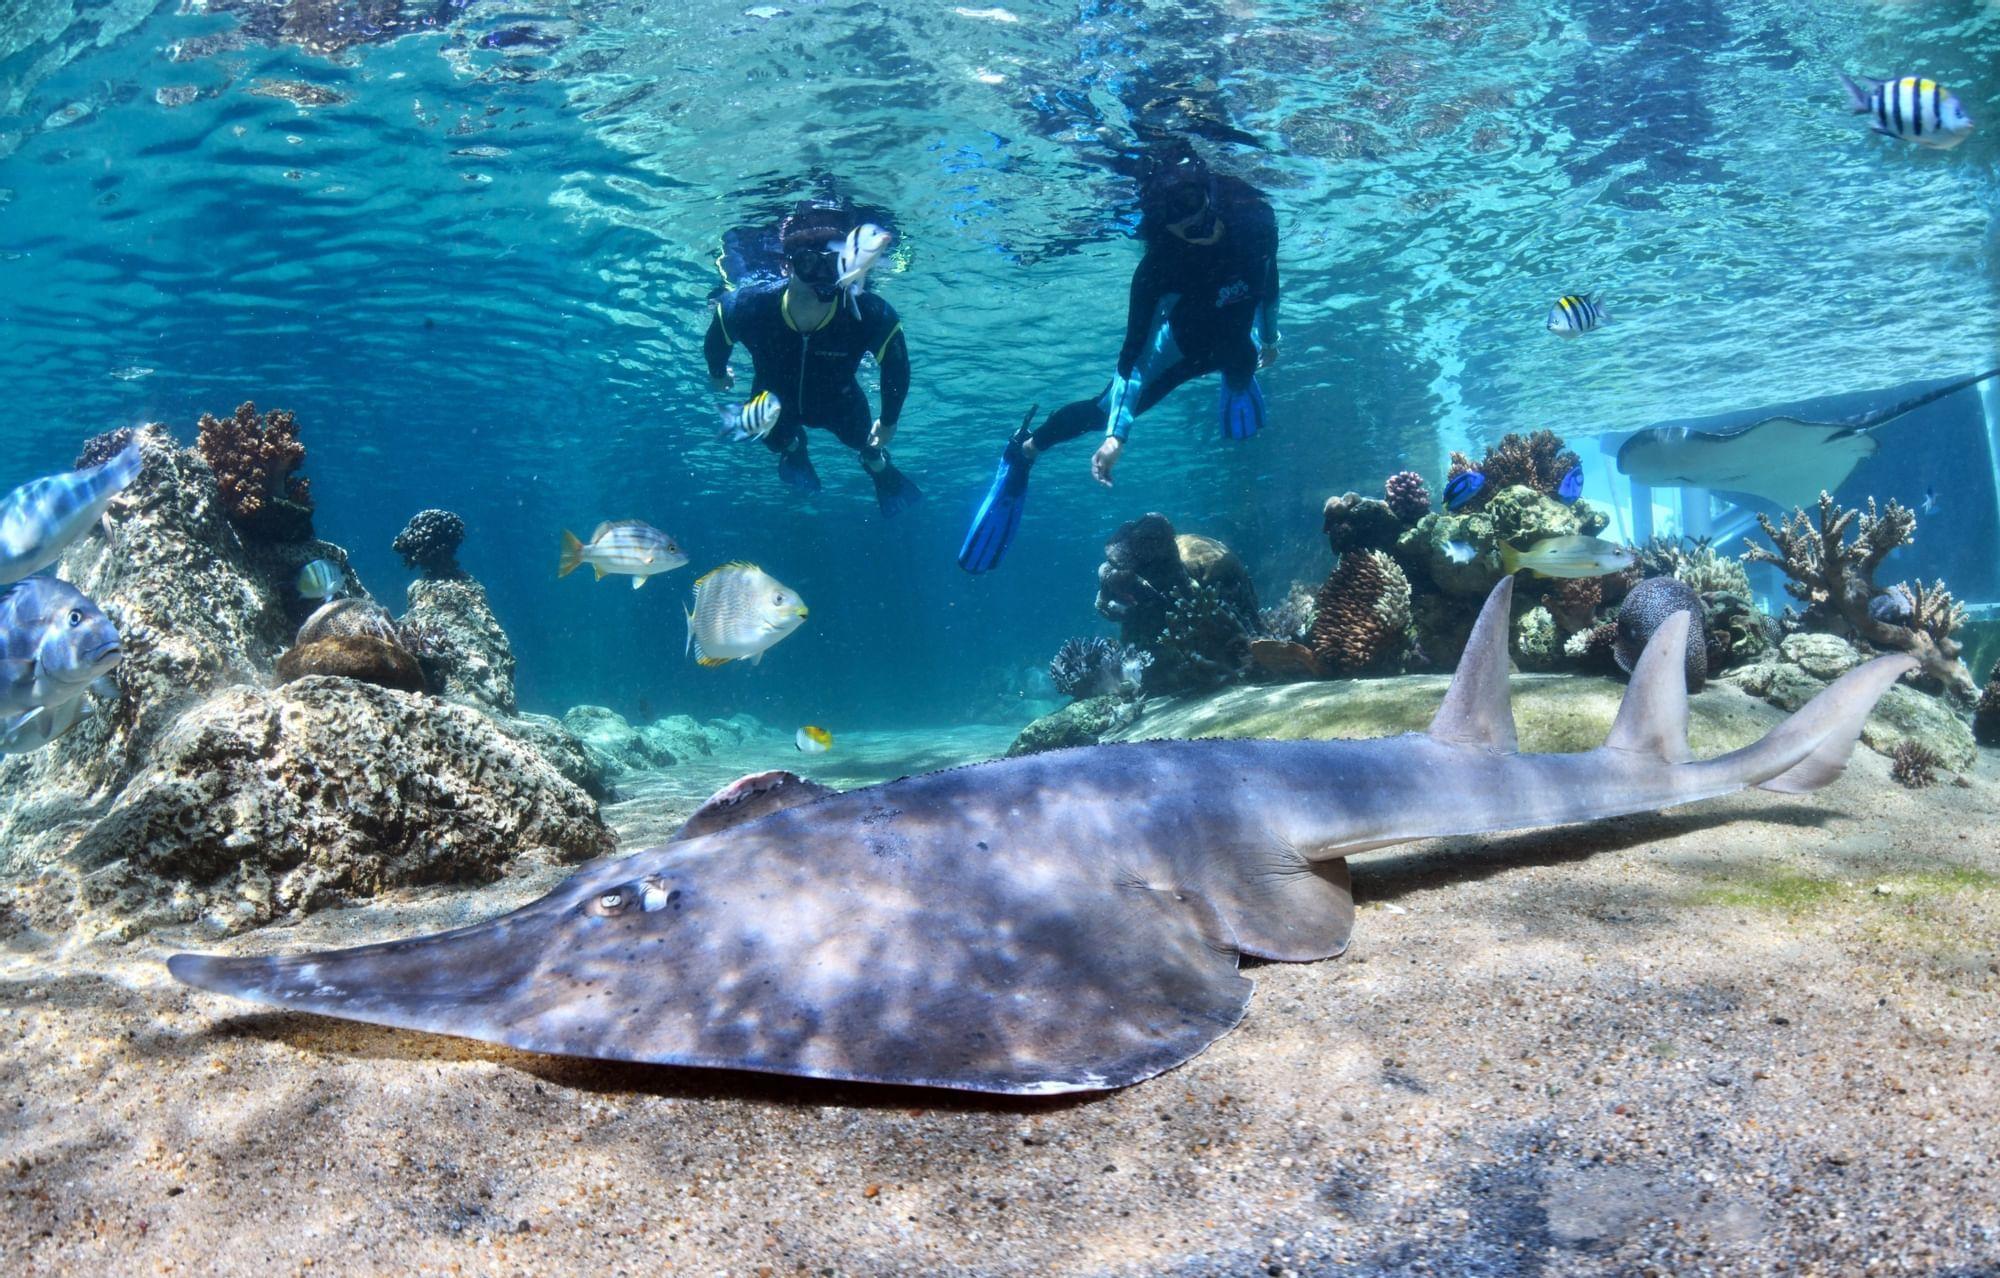 People exploring reefs in deep sea near Daydream Island Resort